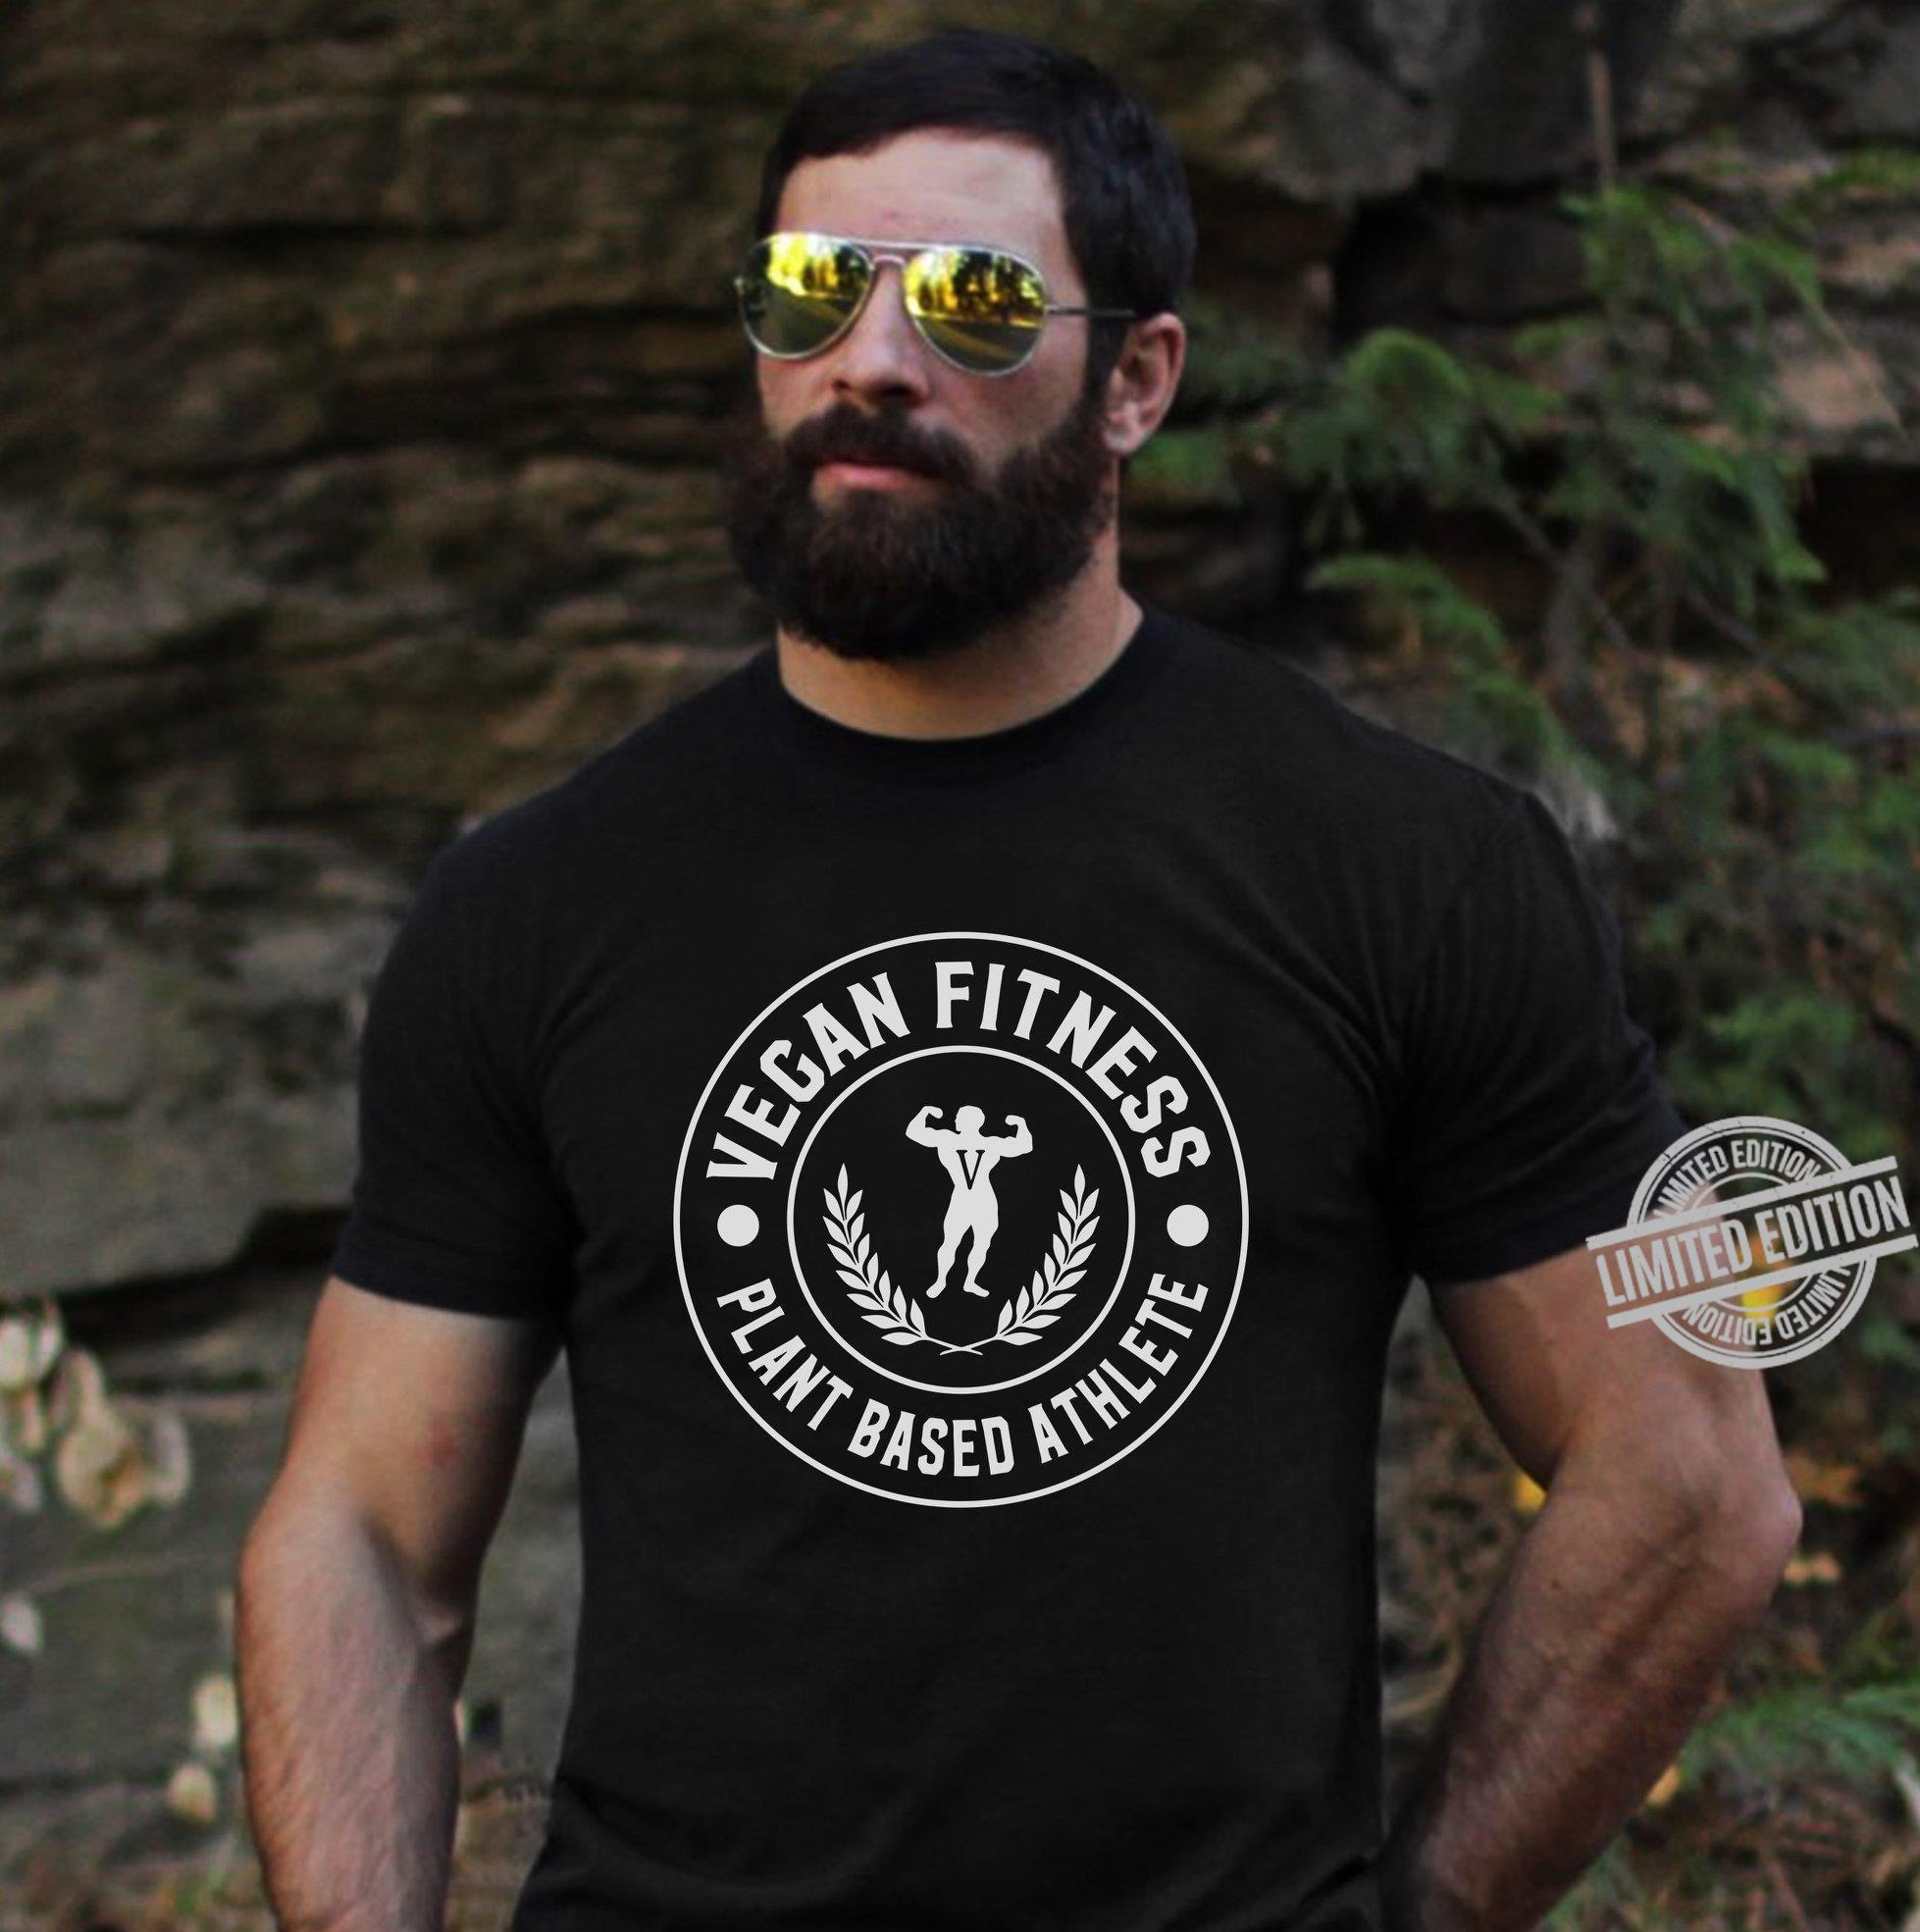 Vegan Fitness Plant Based Athlete Shirt